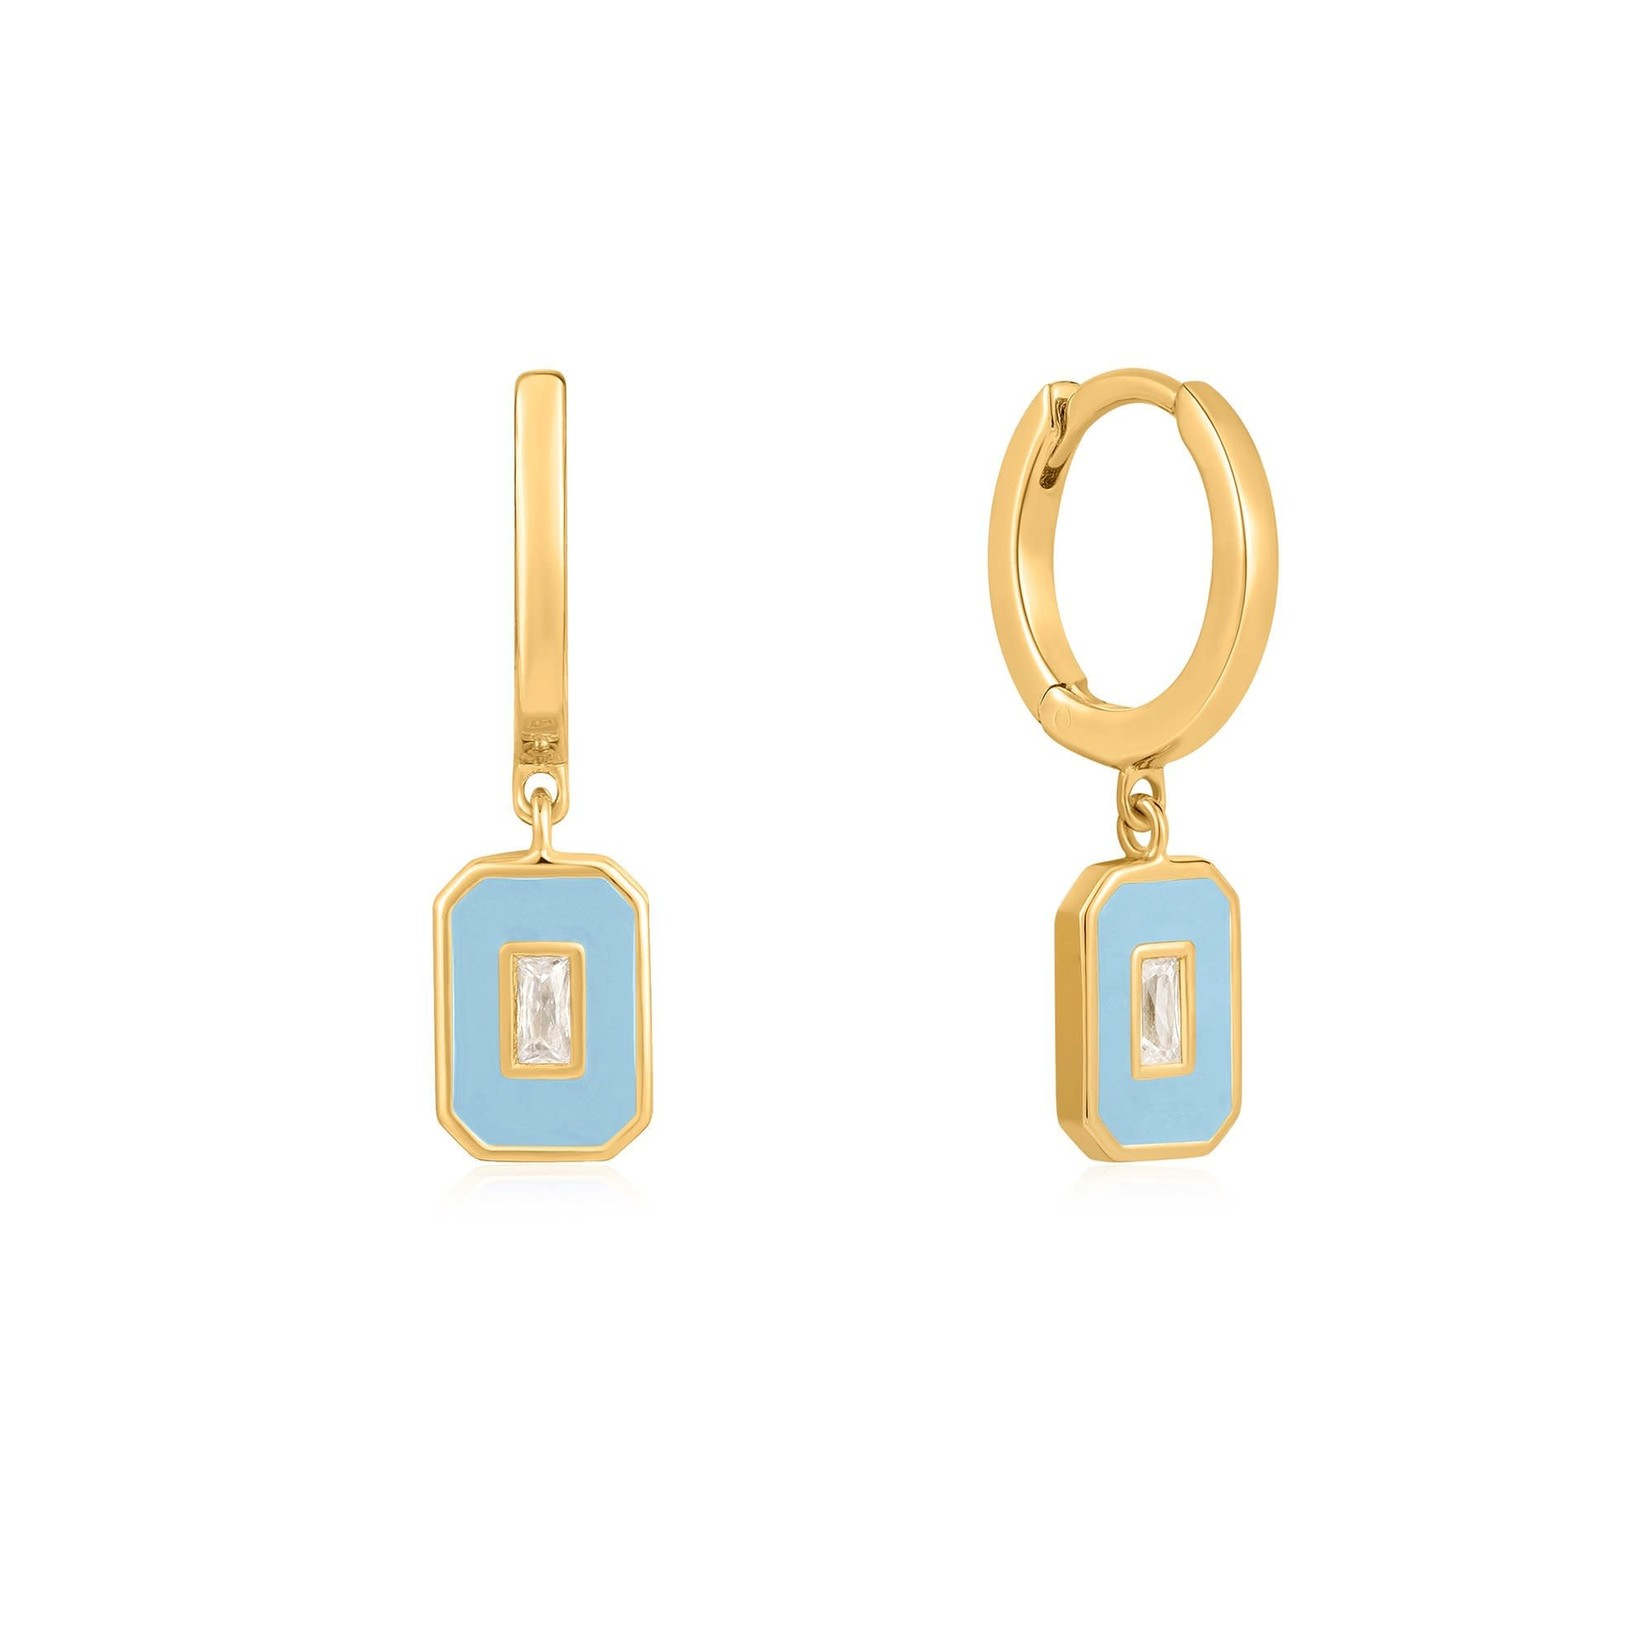 Ania Haie Powder Blue Emblem Earrings